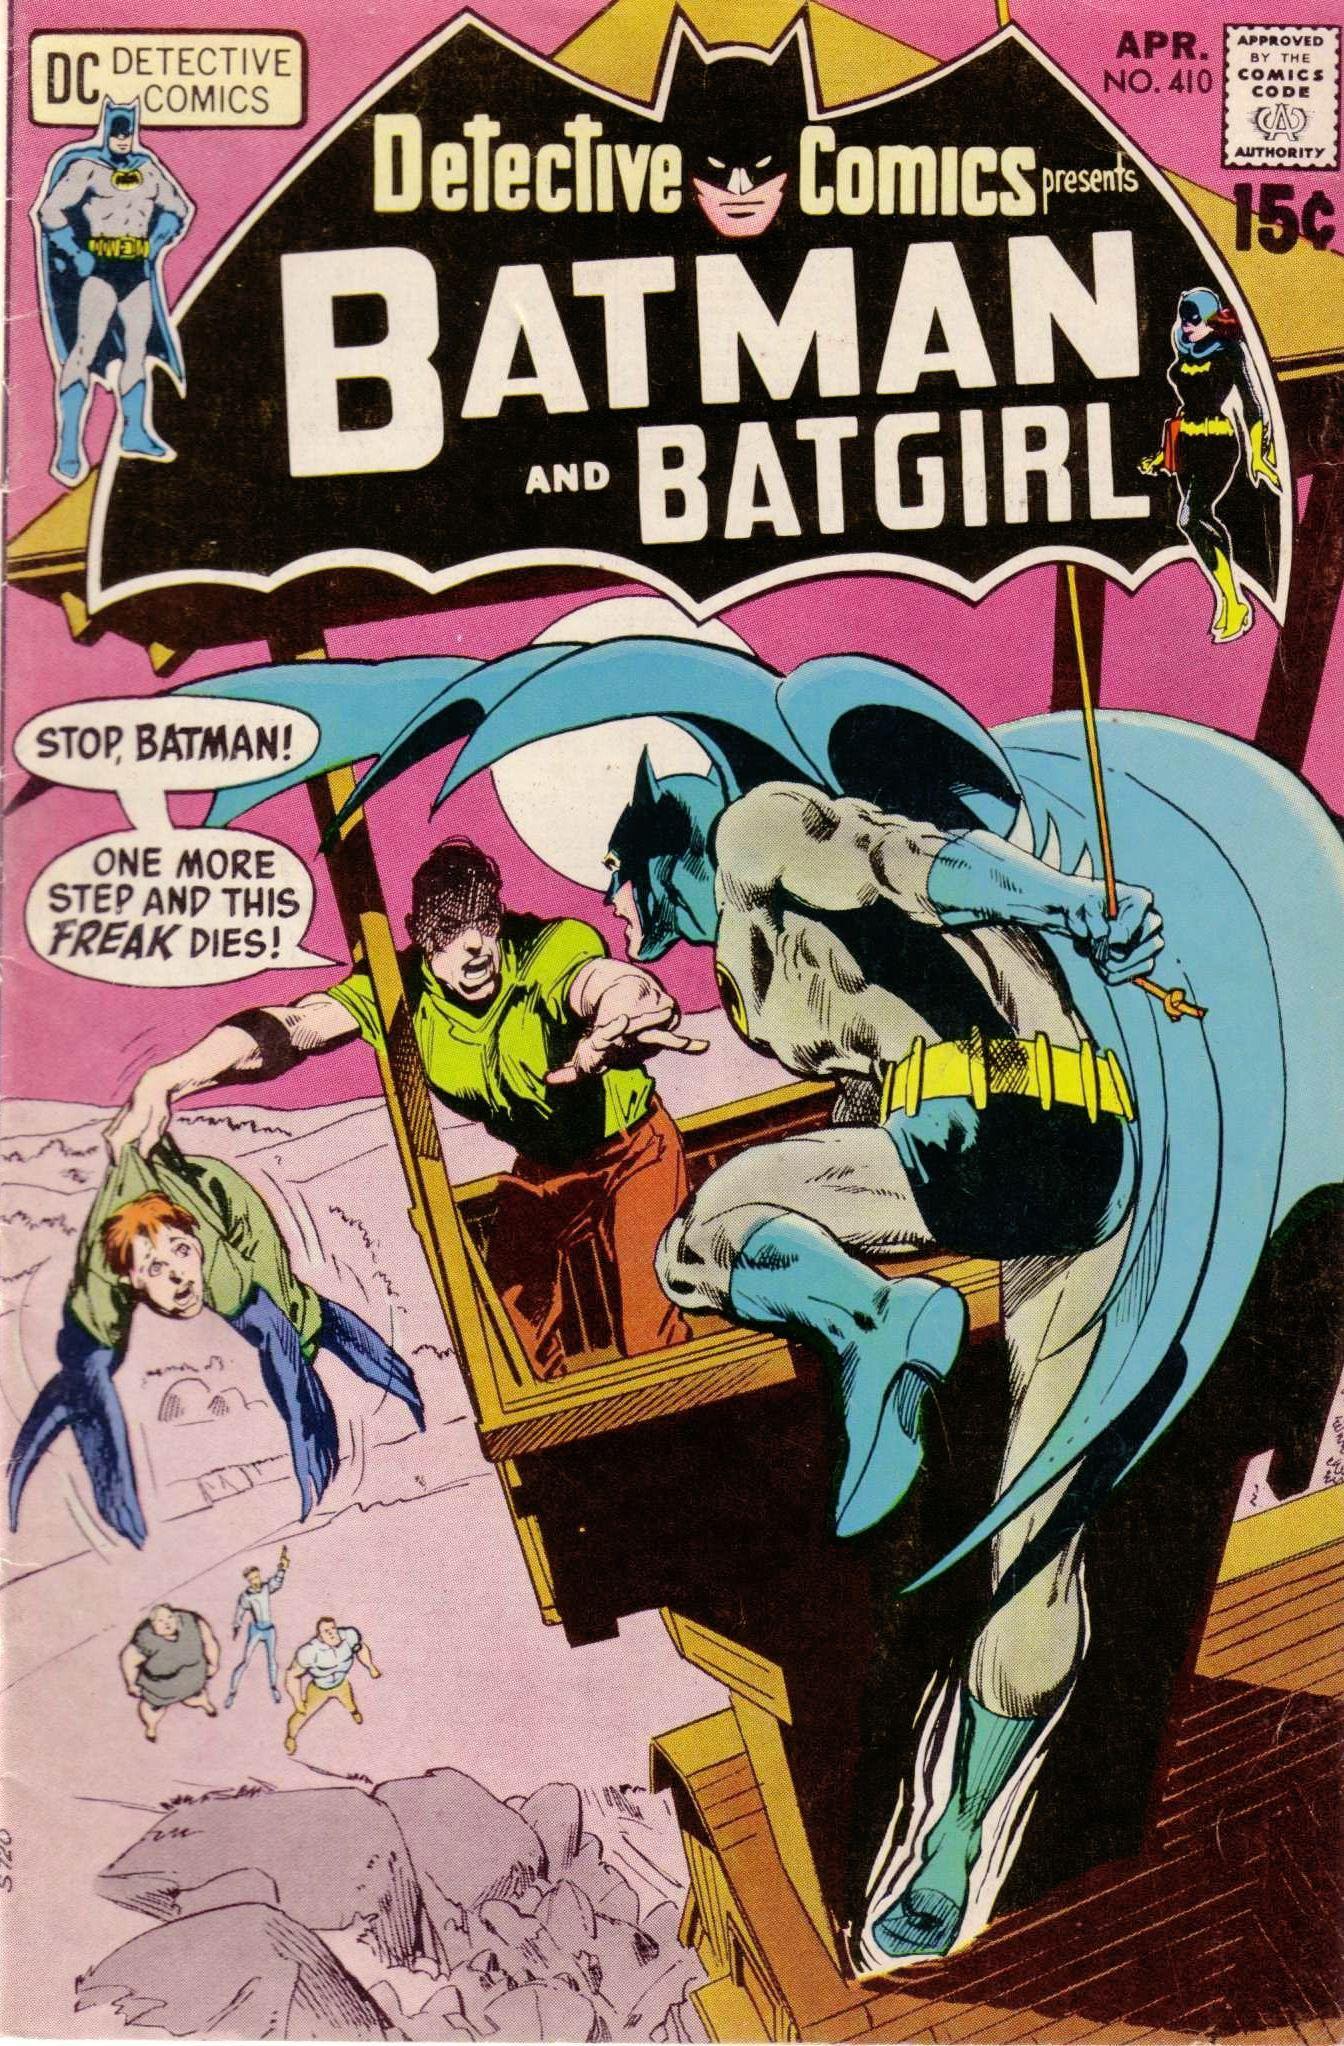 Detective Comics 410 by Neal Adams   Neal Adams   Pinterest